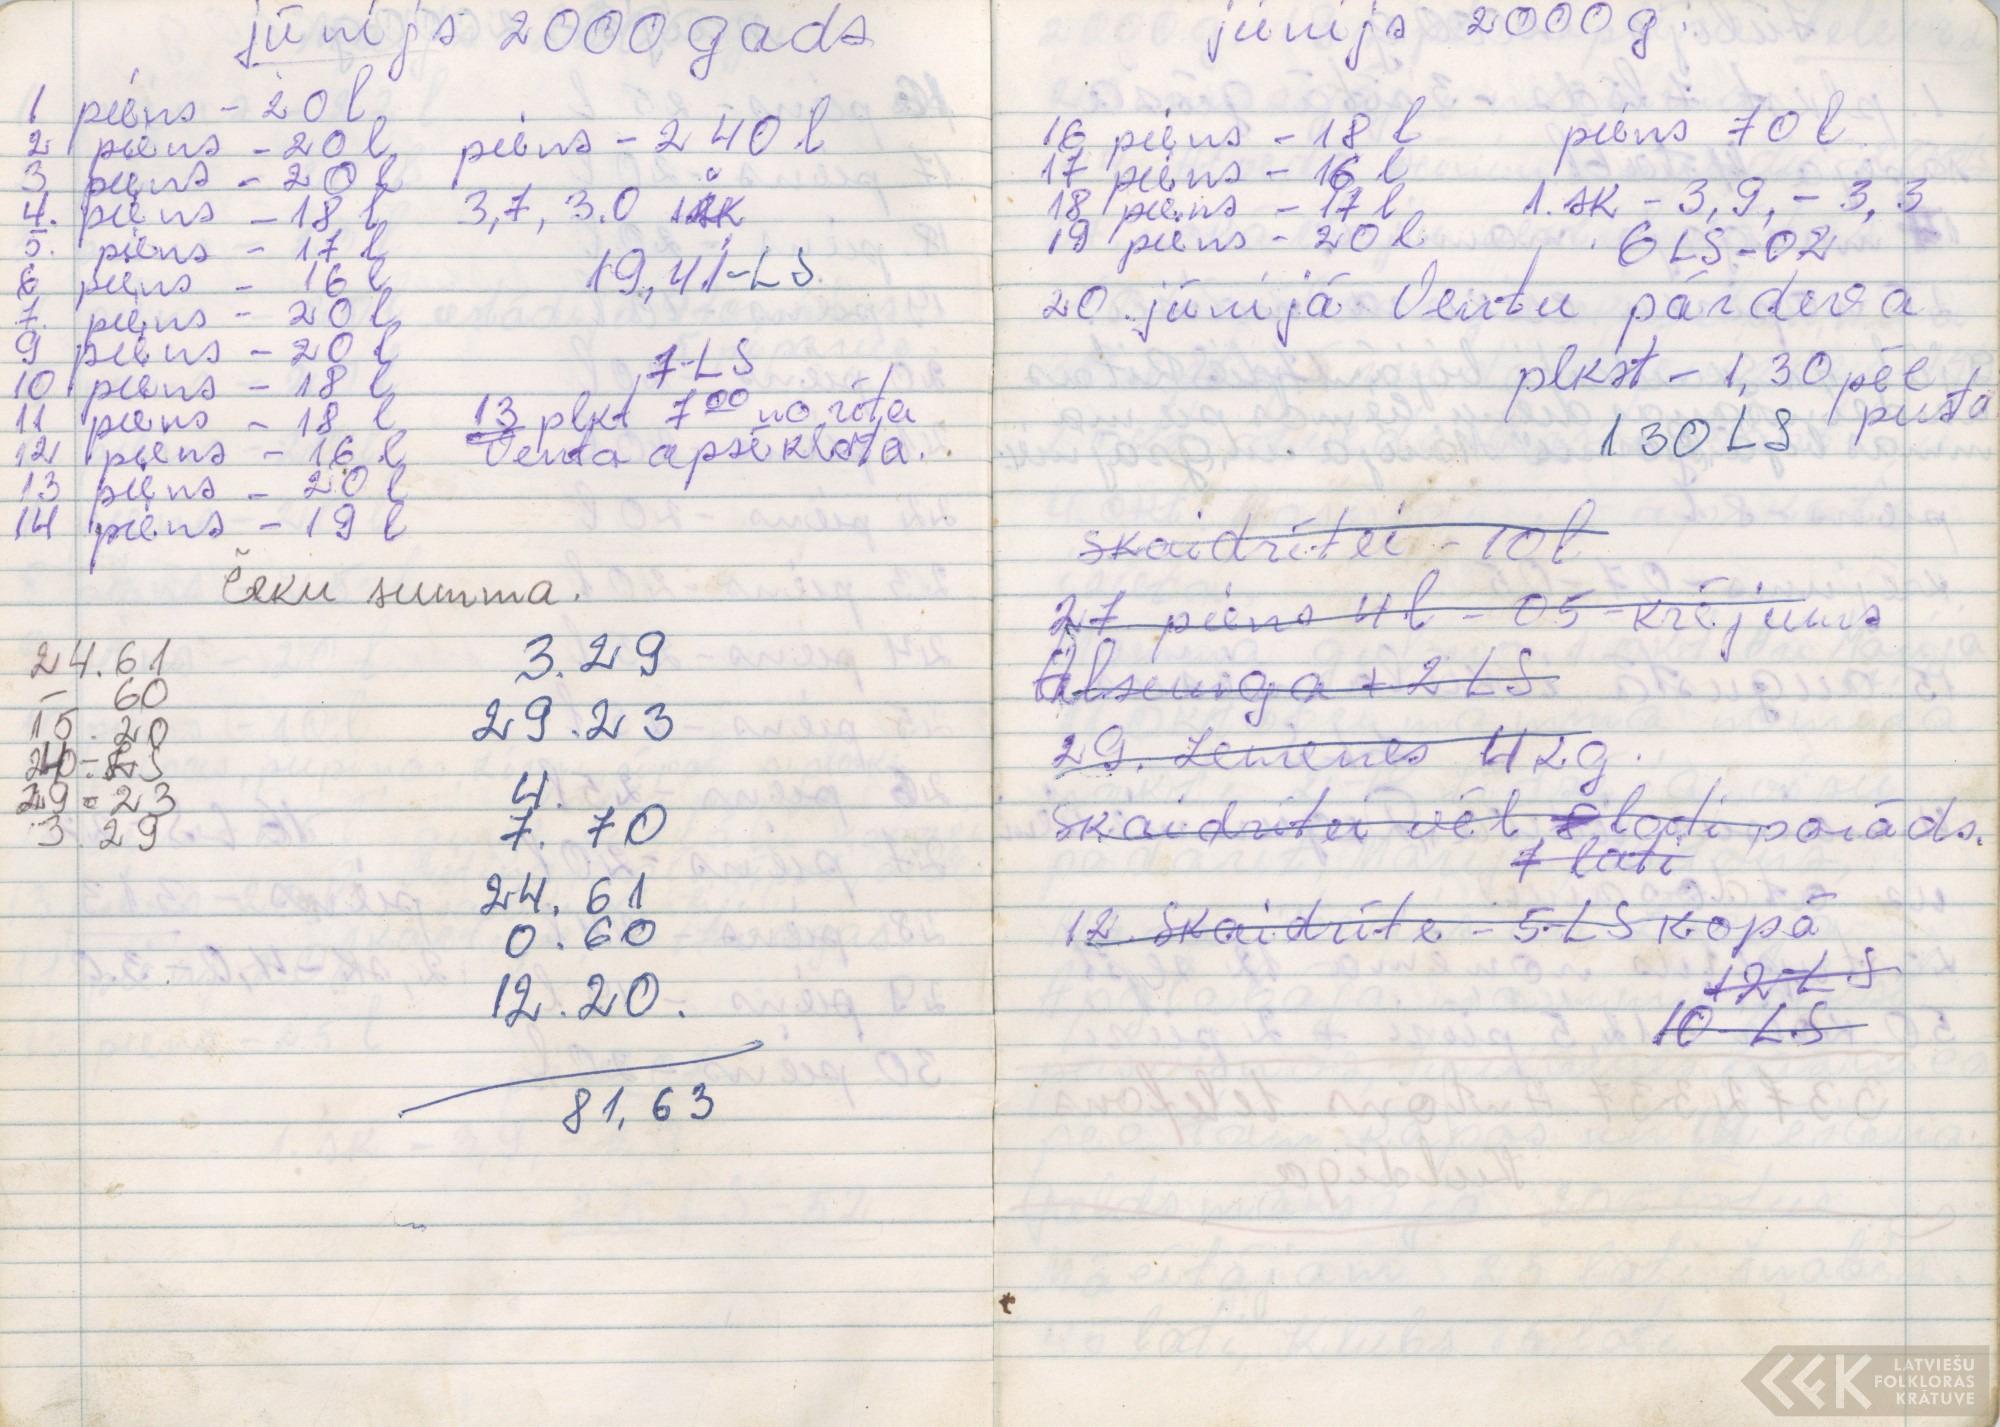 Ak139-Zigridas-Paegles-dienasgramatas-02-0008